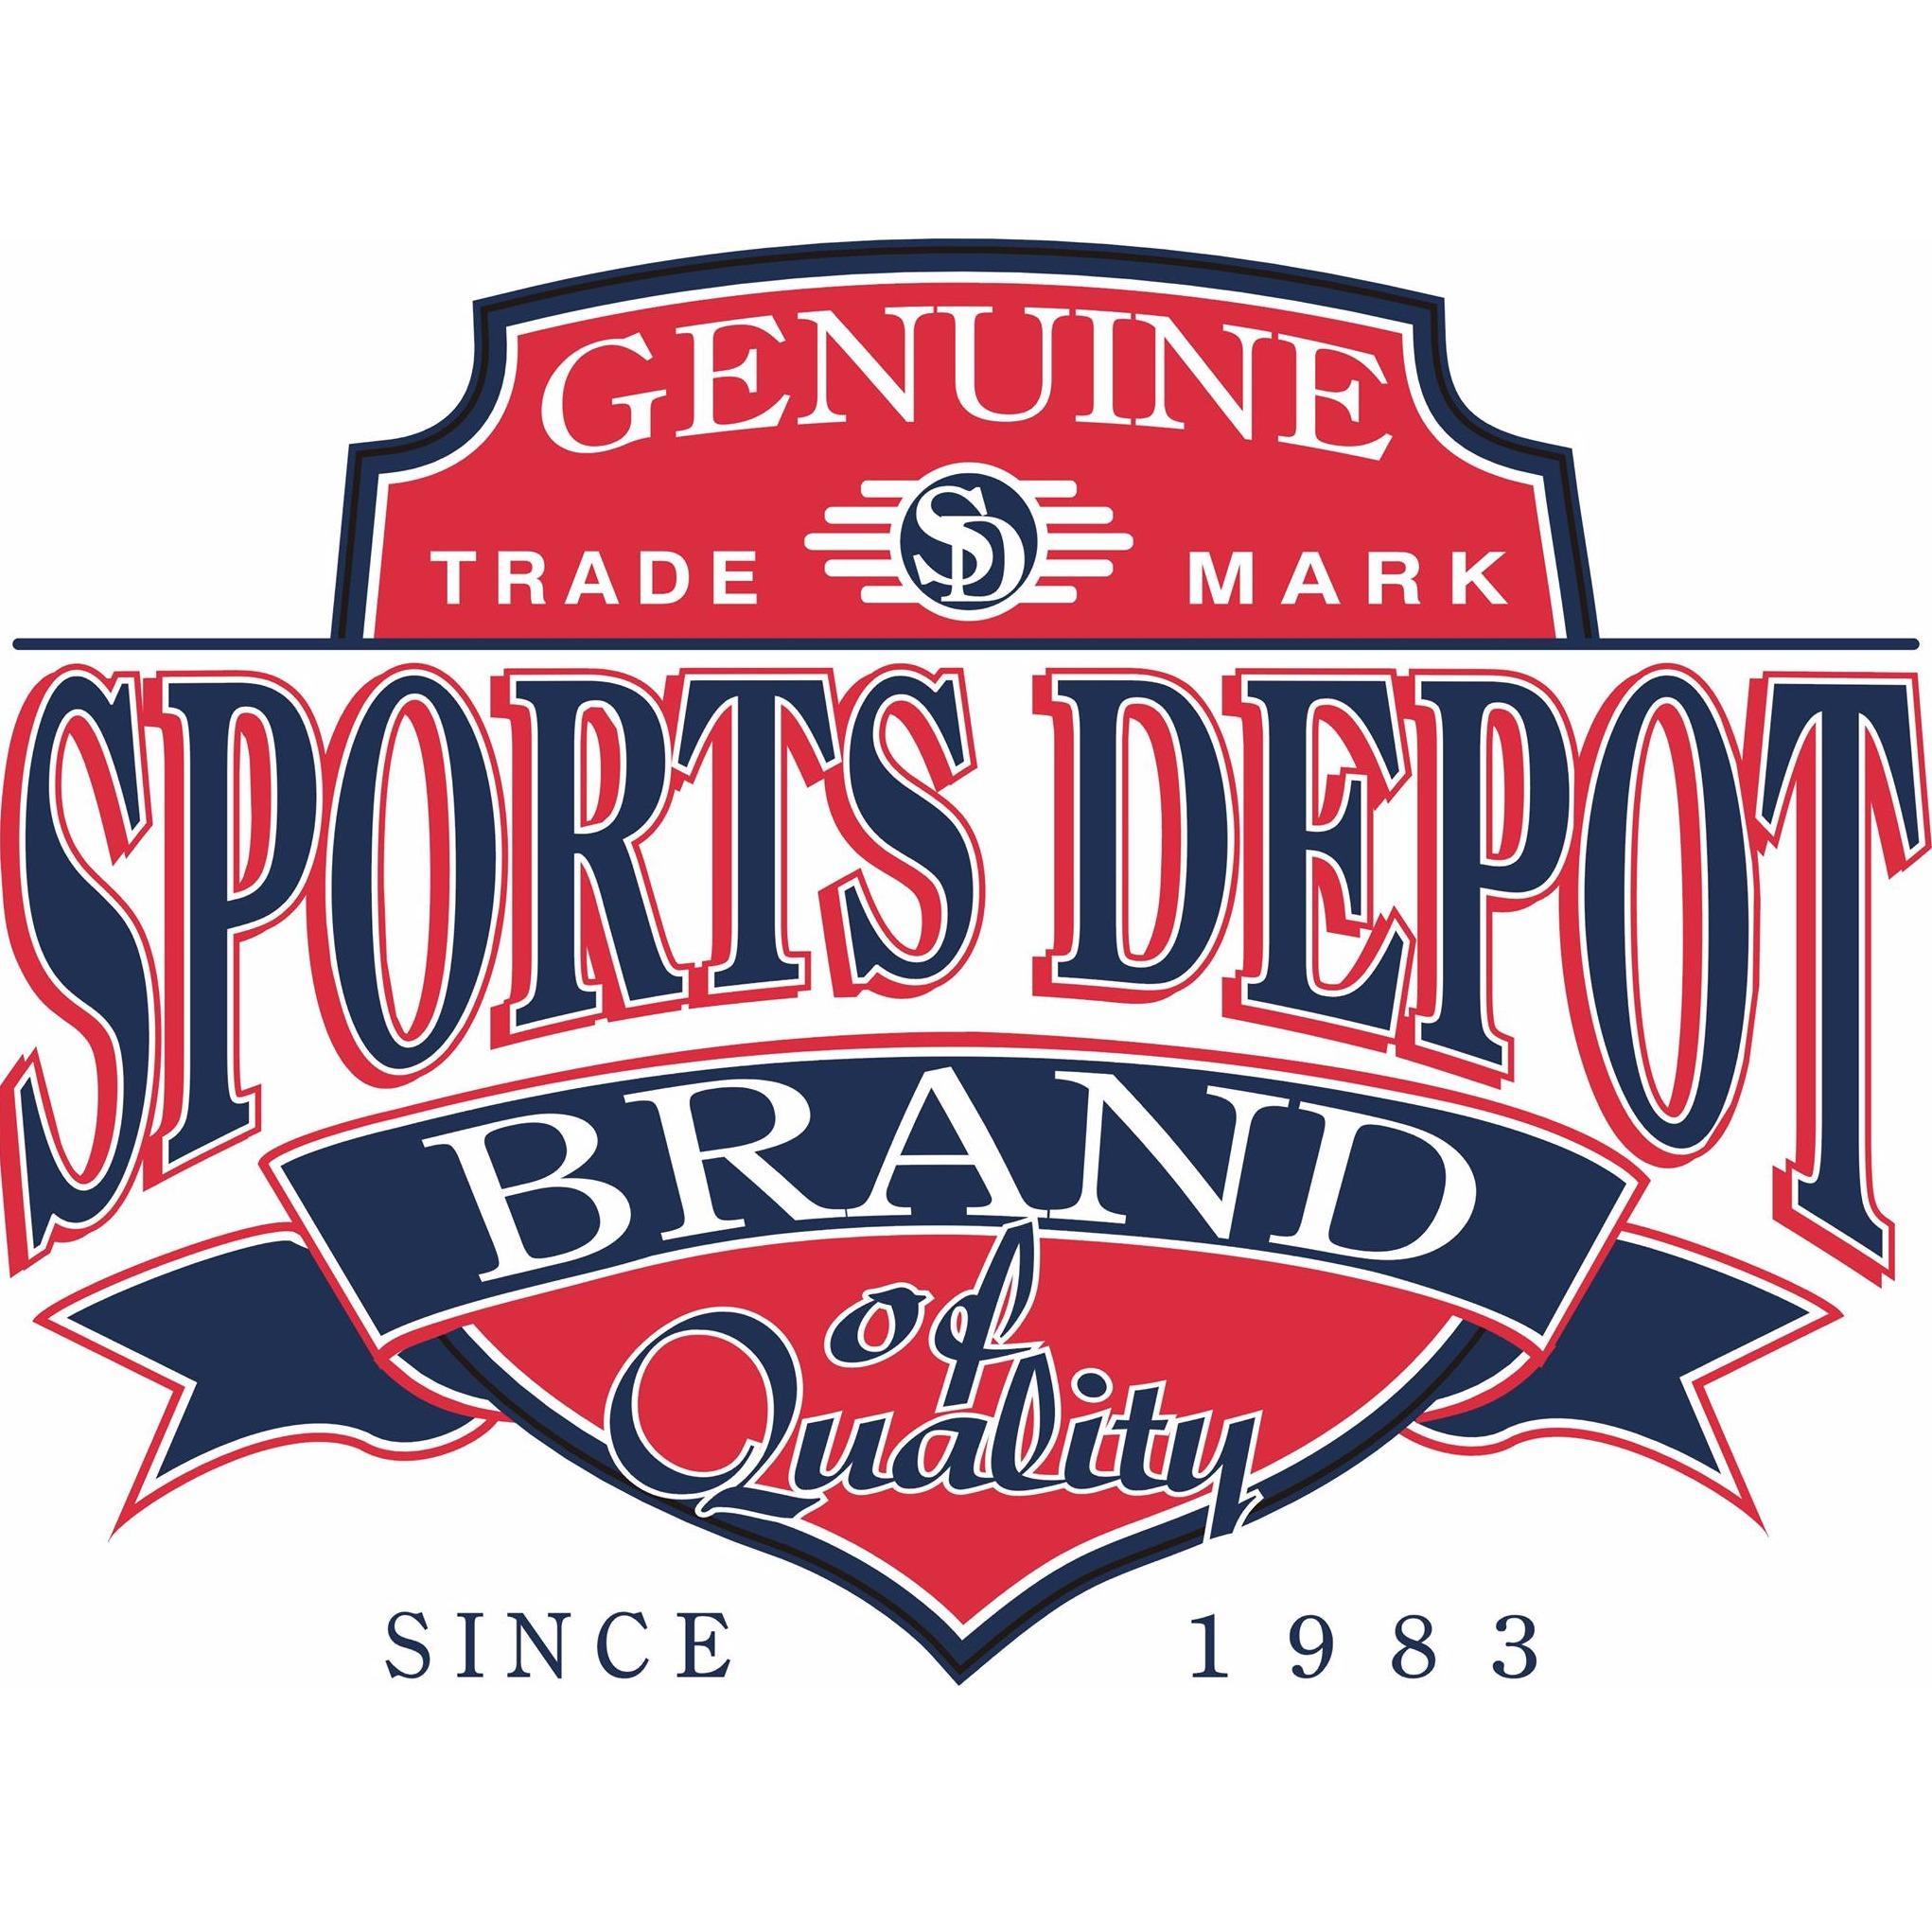 The Sports Depot, Inc. - Rock Island, IL - Apparel Stores